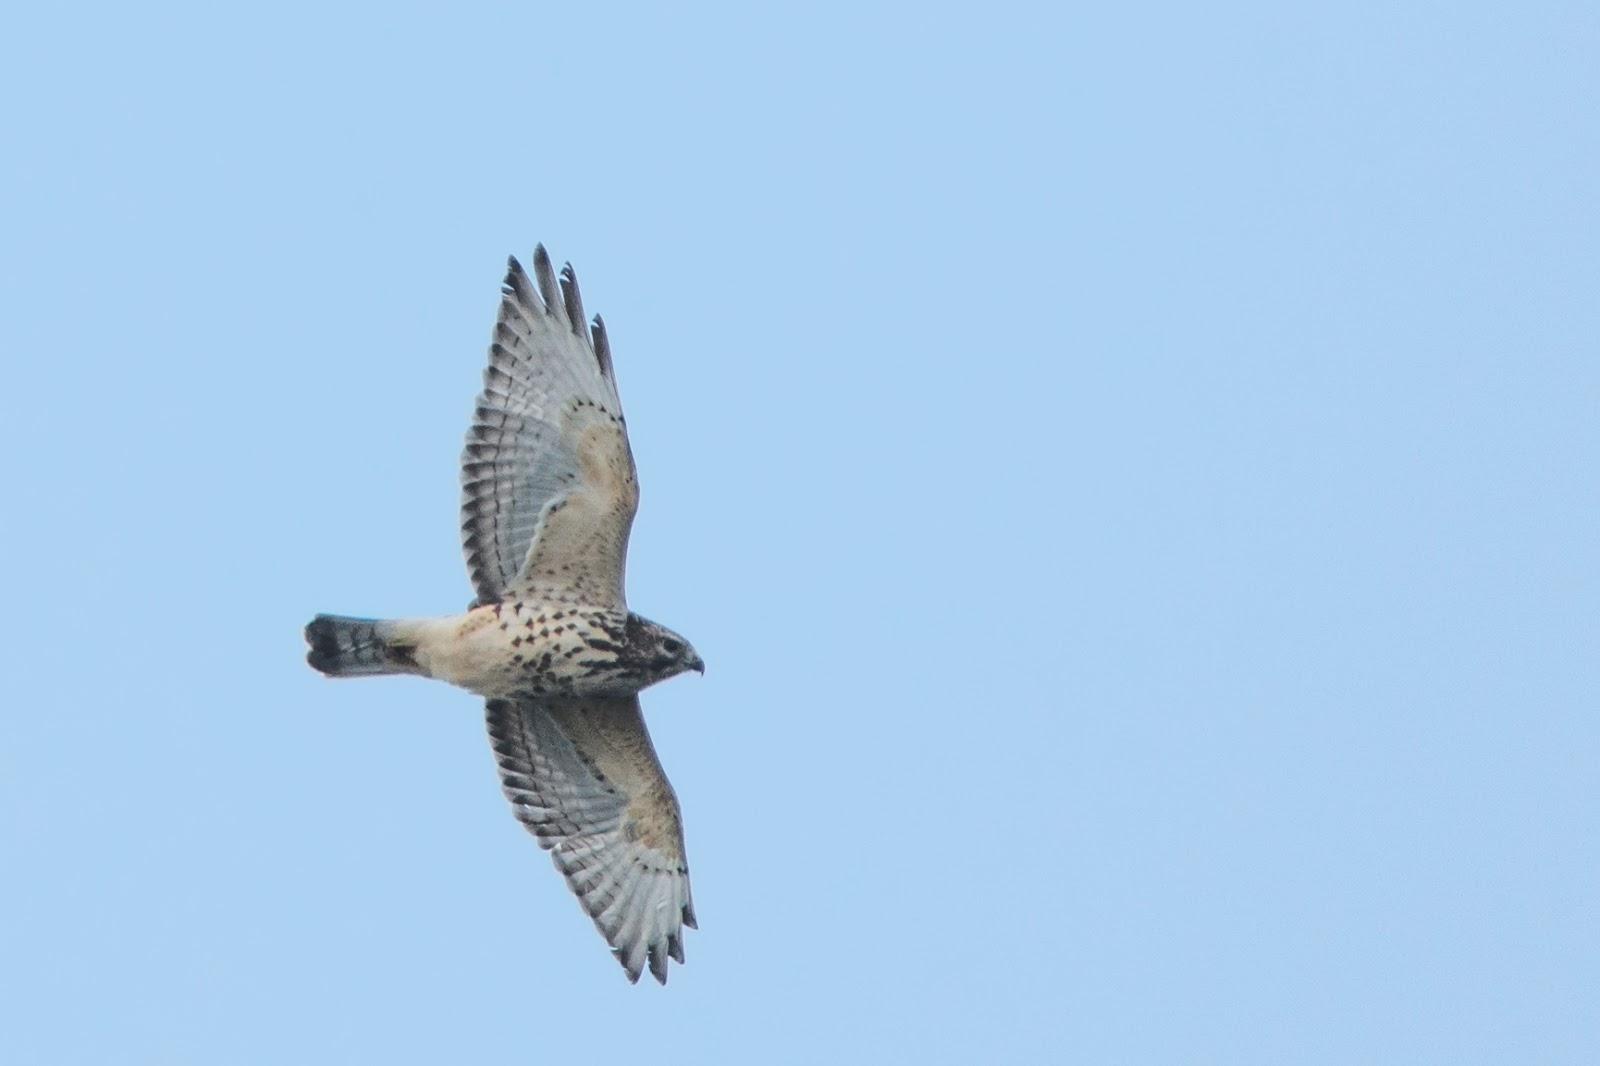 Jerry's Birding / Digiscoping Blog: HawkFest 2015 ...